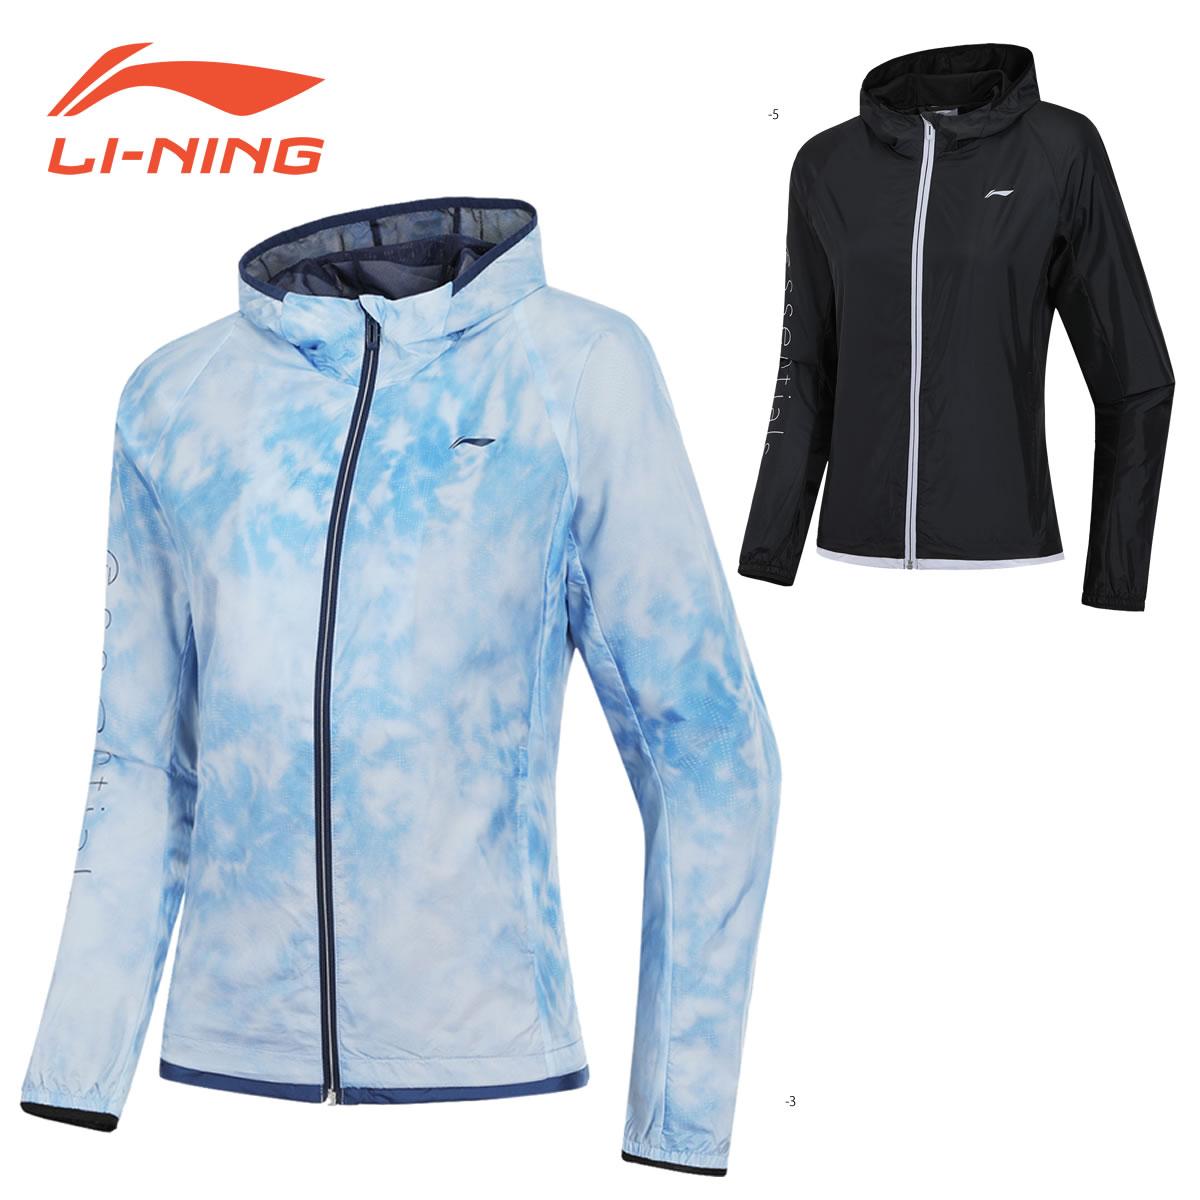 LI-NING AFDN178 ウォームアップジャケット バドミントンウェア(レディース) リーニン